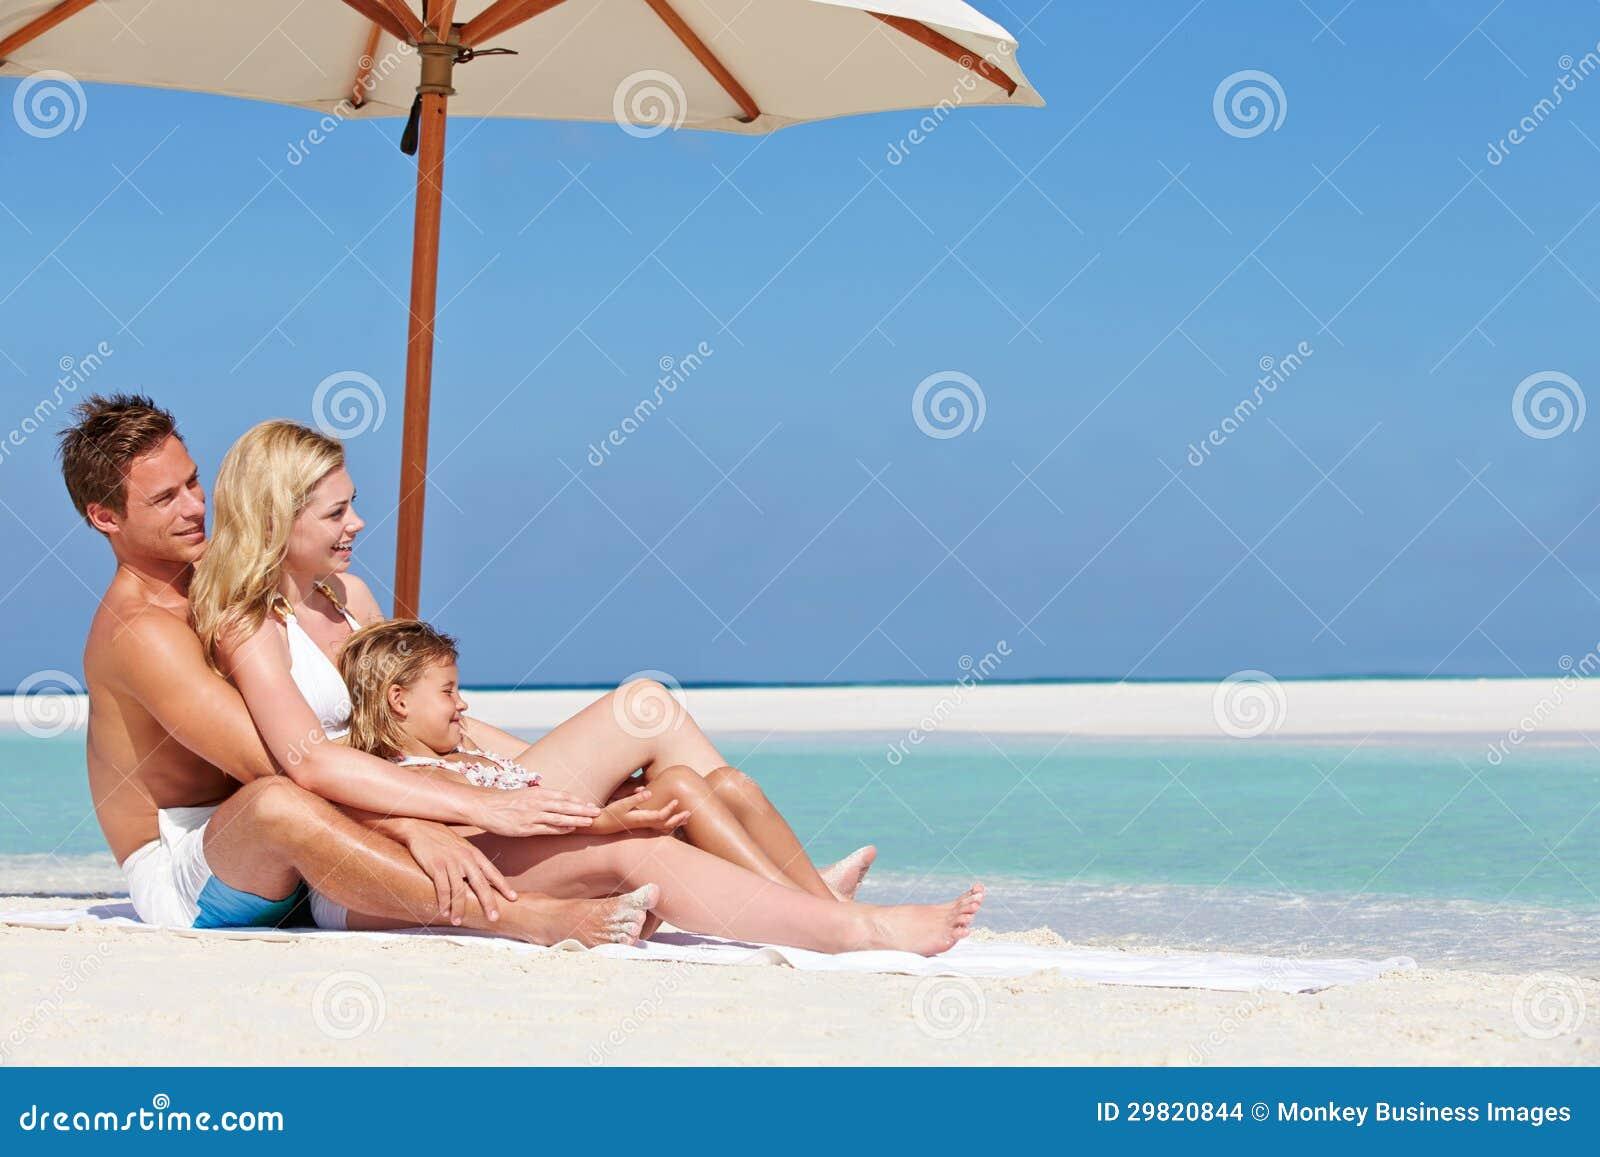 Family Sitting Under Umbrella On Beach Holiday